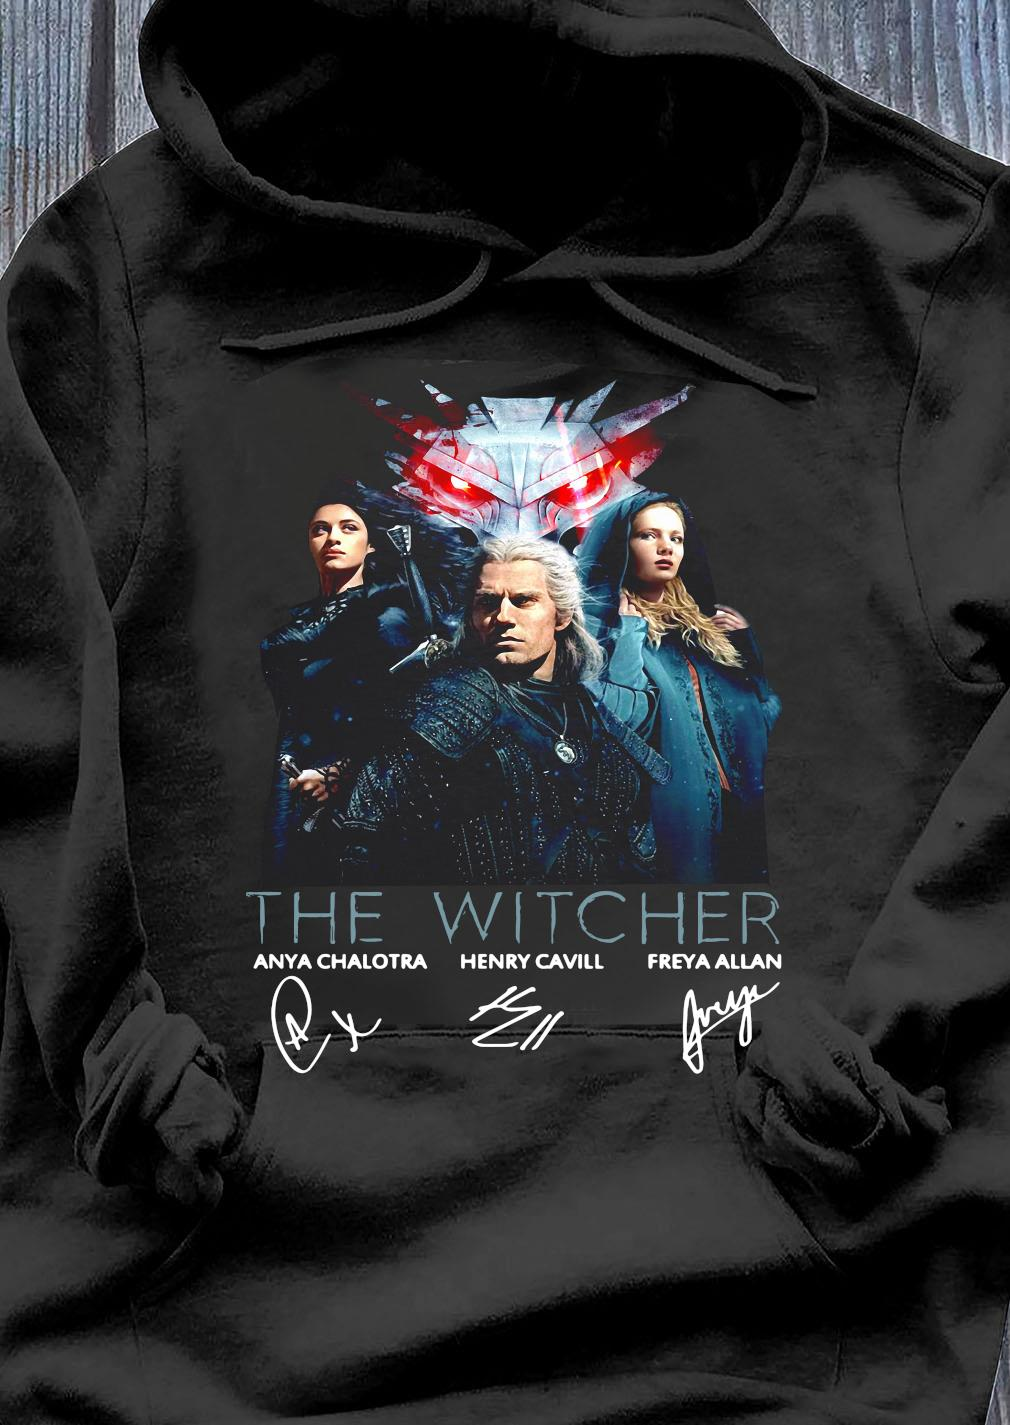 The Witcher Tv Movies Series Anya Chalotra Henry Cavill And Freya Allan Signature Shirt Hoodie